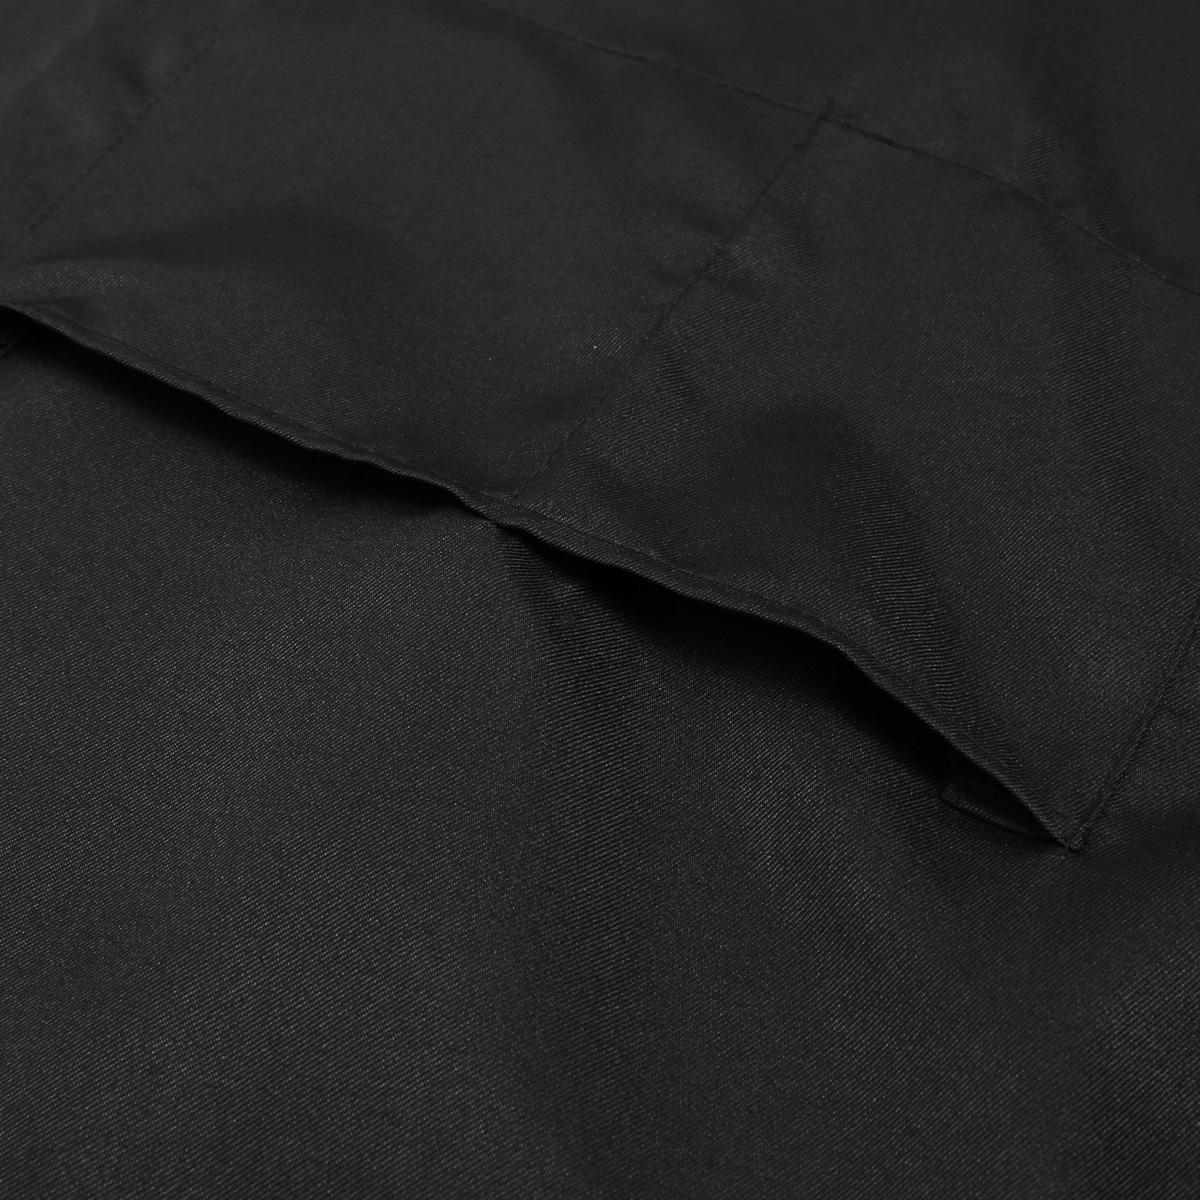 White apron hours - Mens Ladies Womens Work Apron Overall Plain Uniform Catering Pocket Black